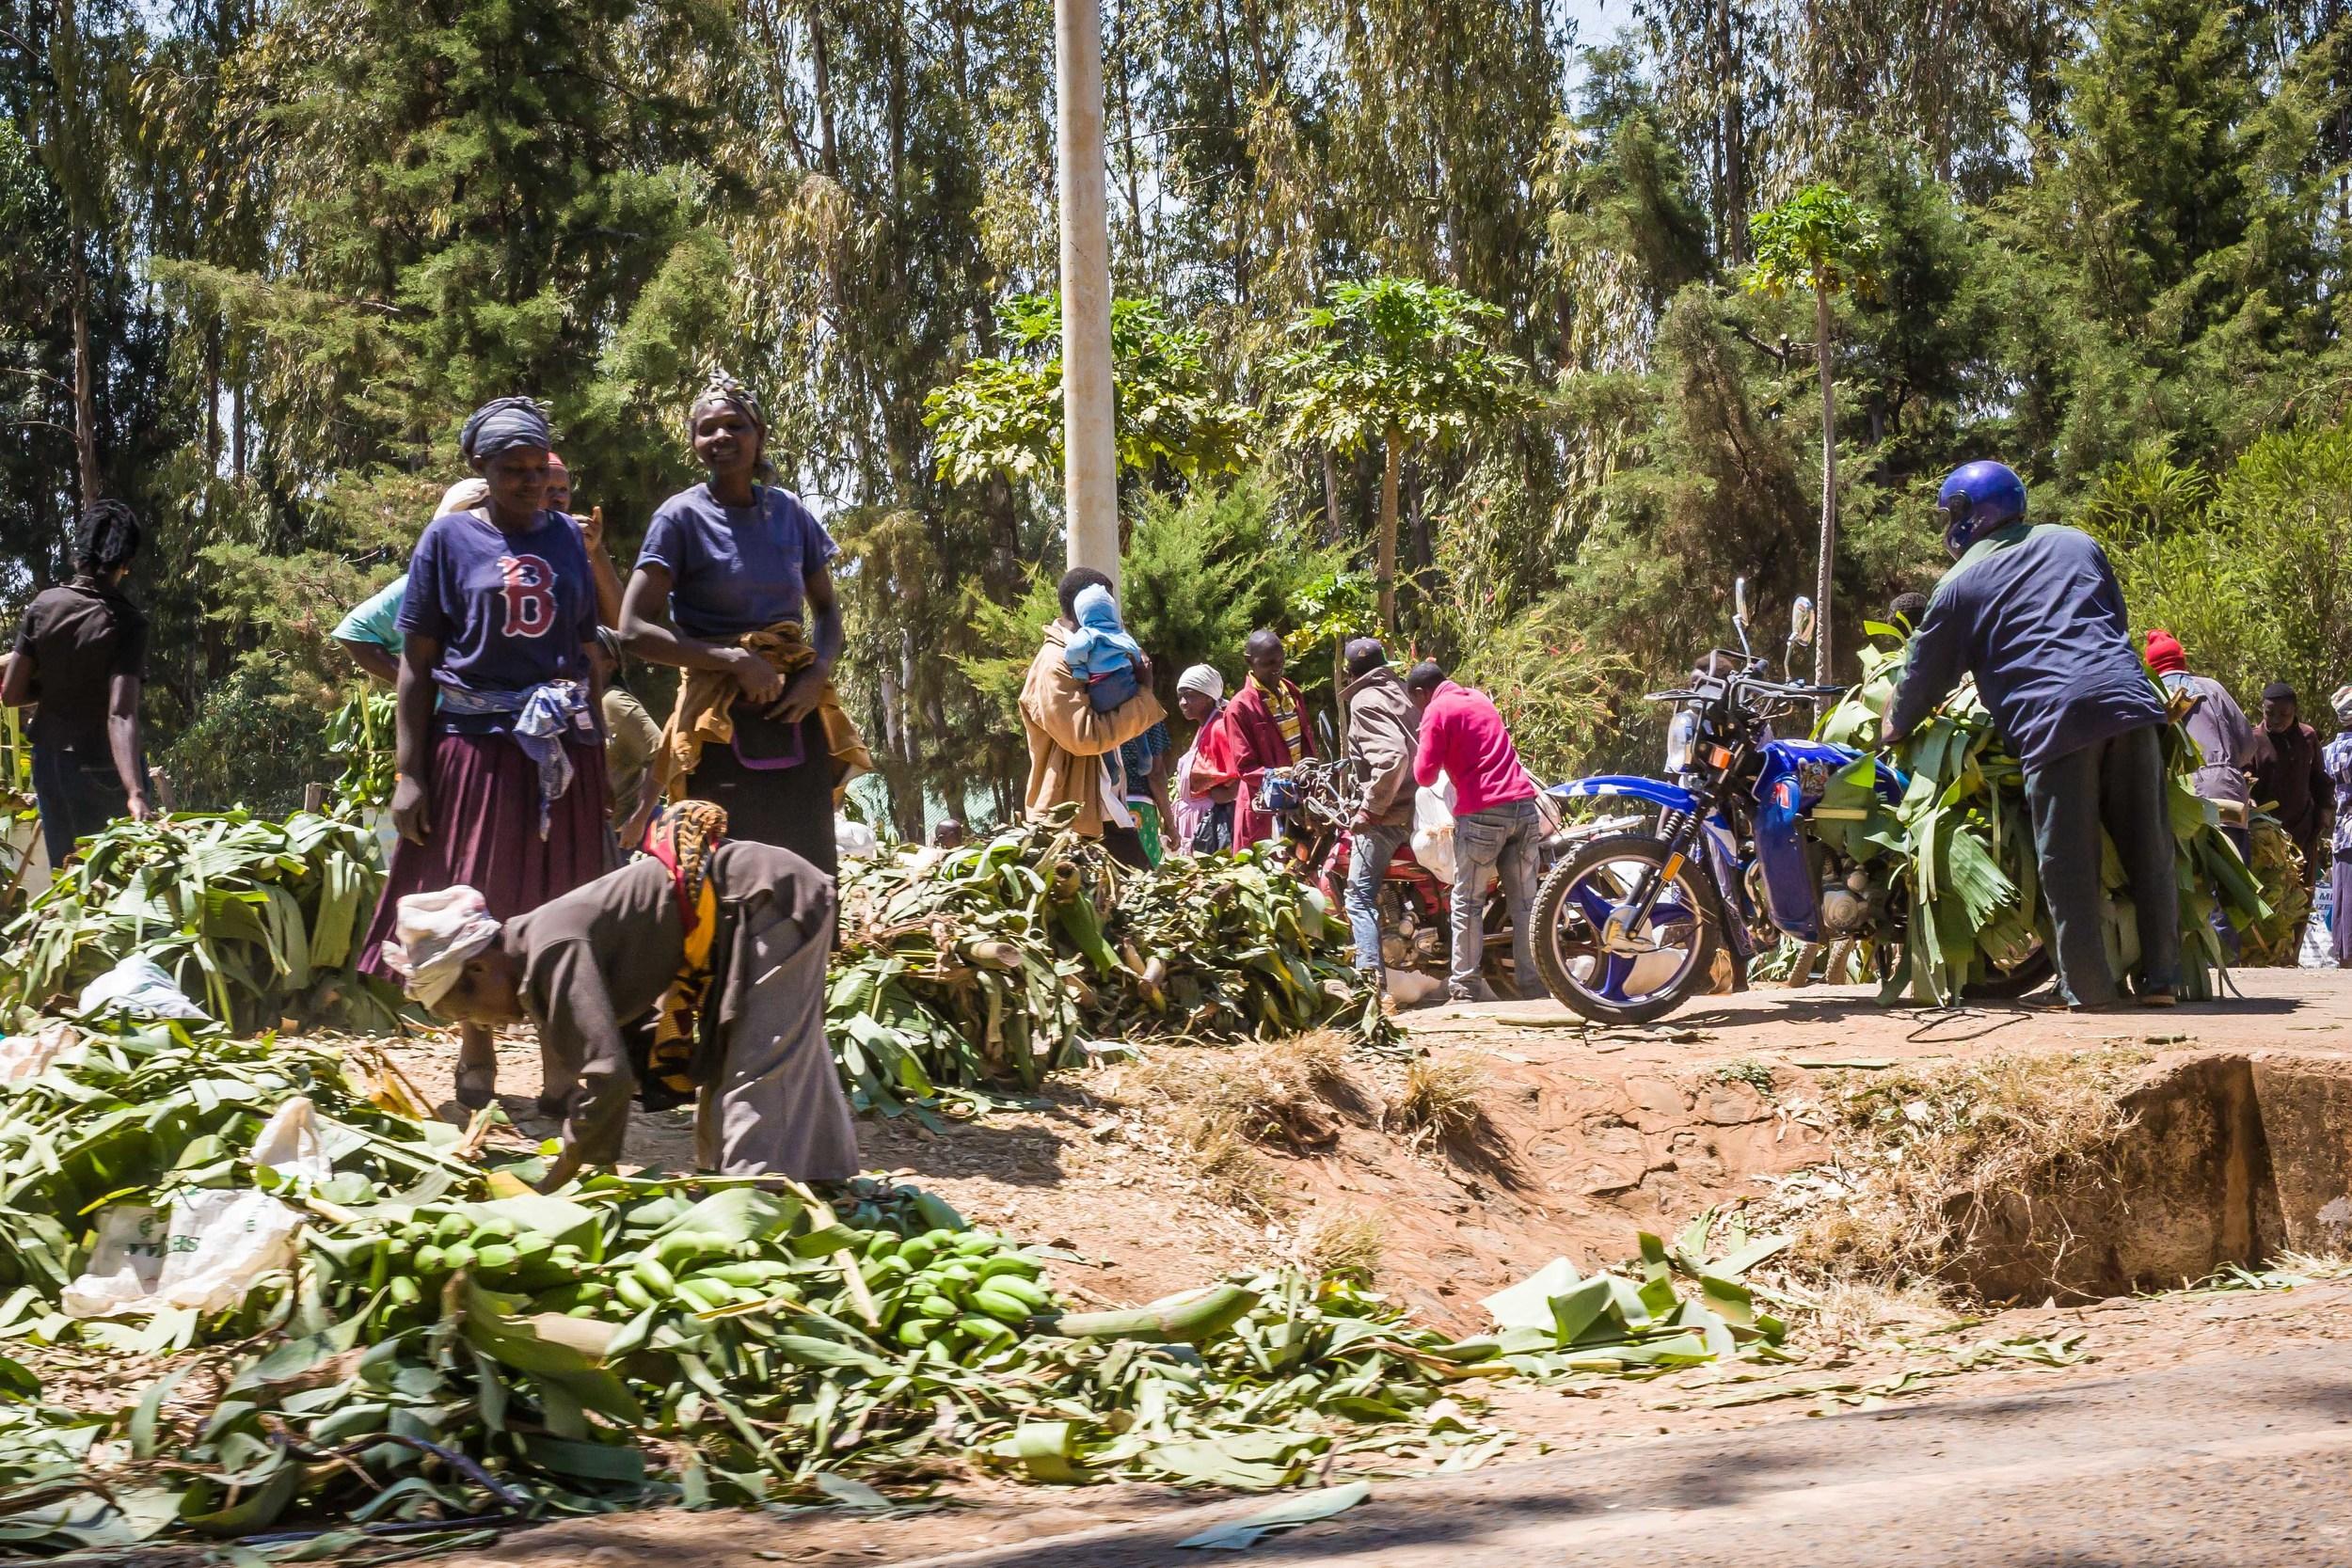 Banana Market, On the Road to Nairobi, Kenya